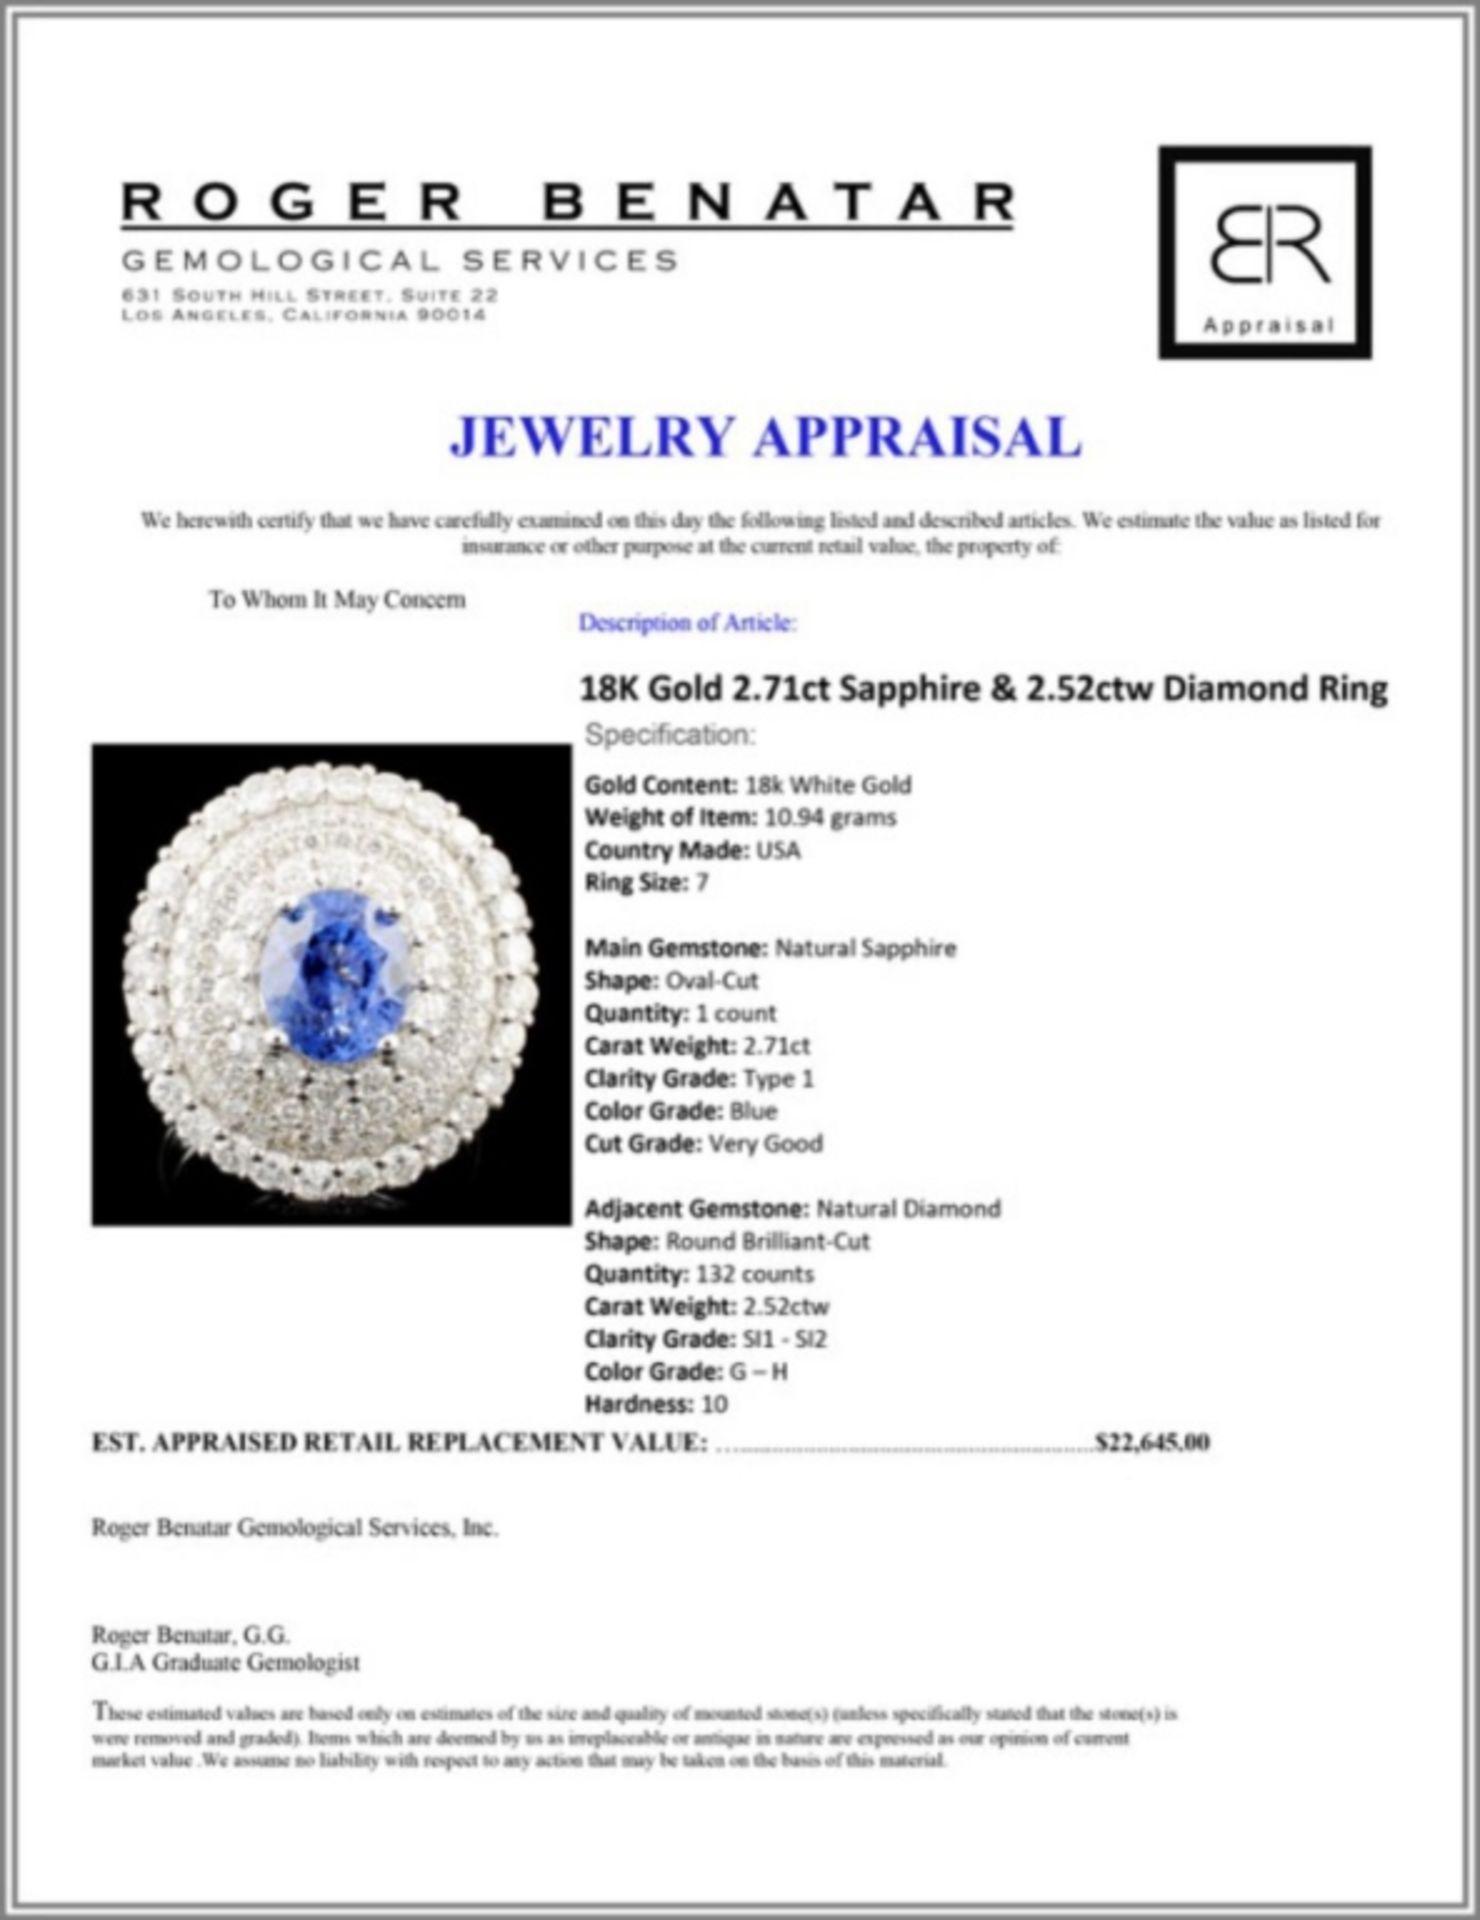 18K Gold 2.71ct Sapphire & 2.52ctw Diamond Ring - Image 5 of 5